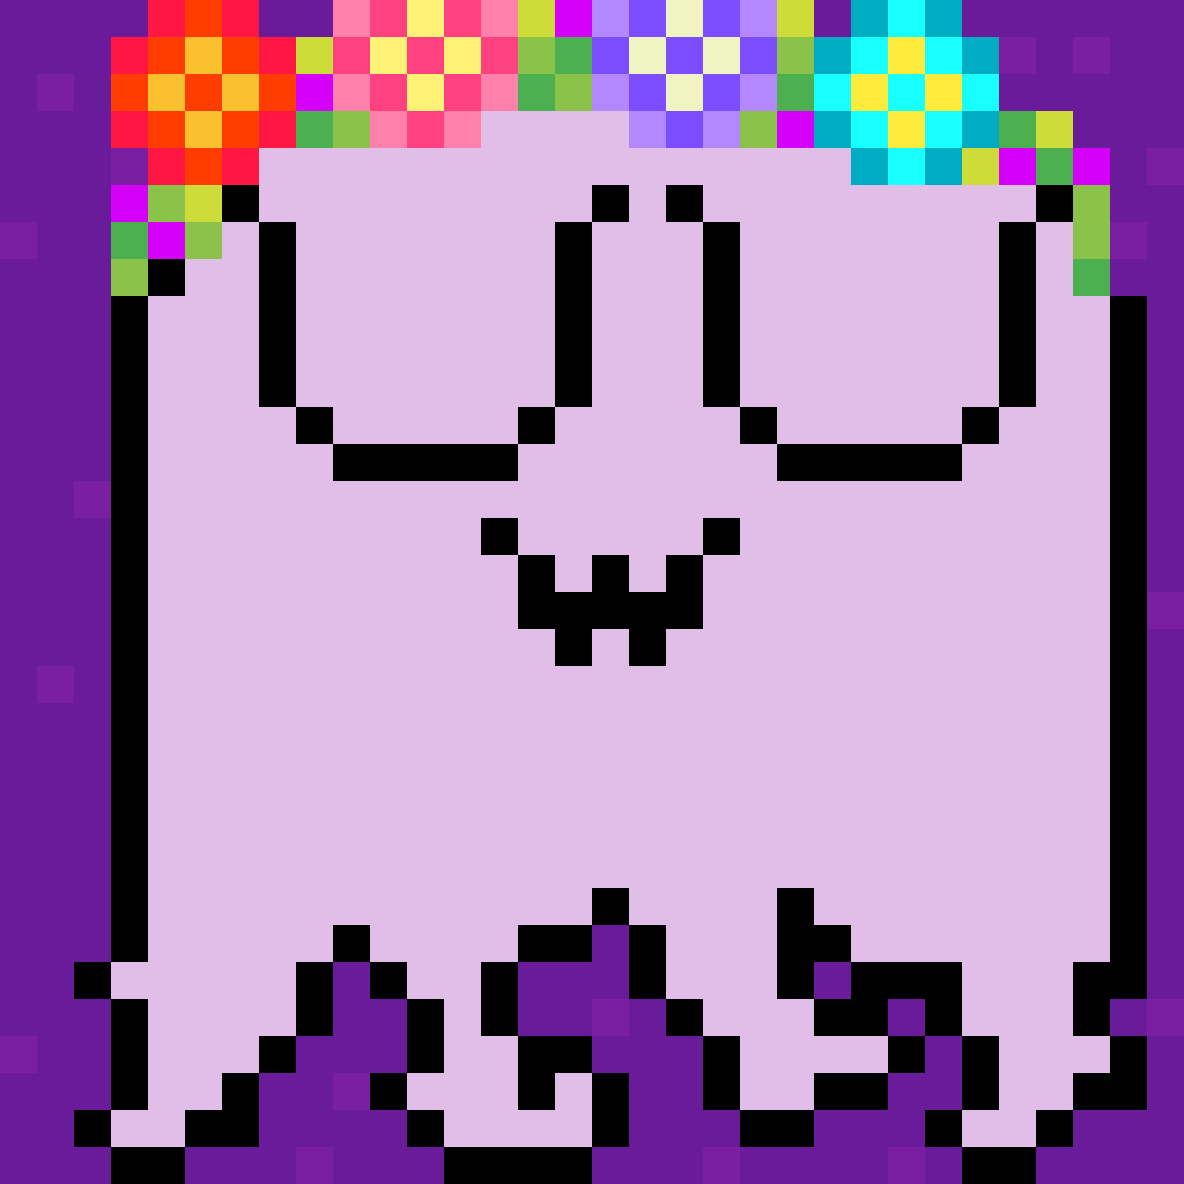 Flower Ghost (UwU) by Dandelion-Dream